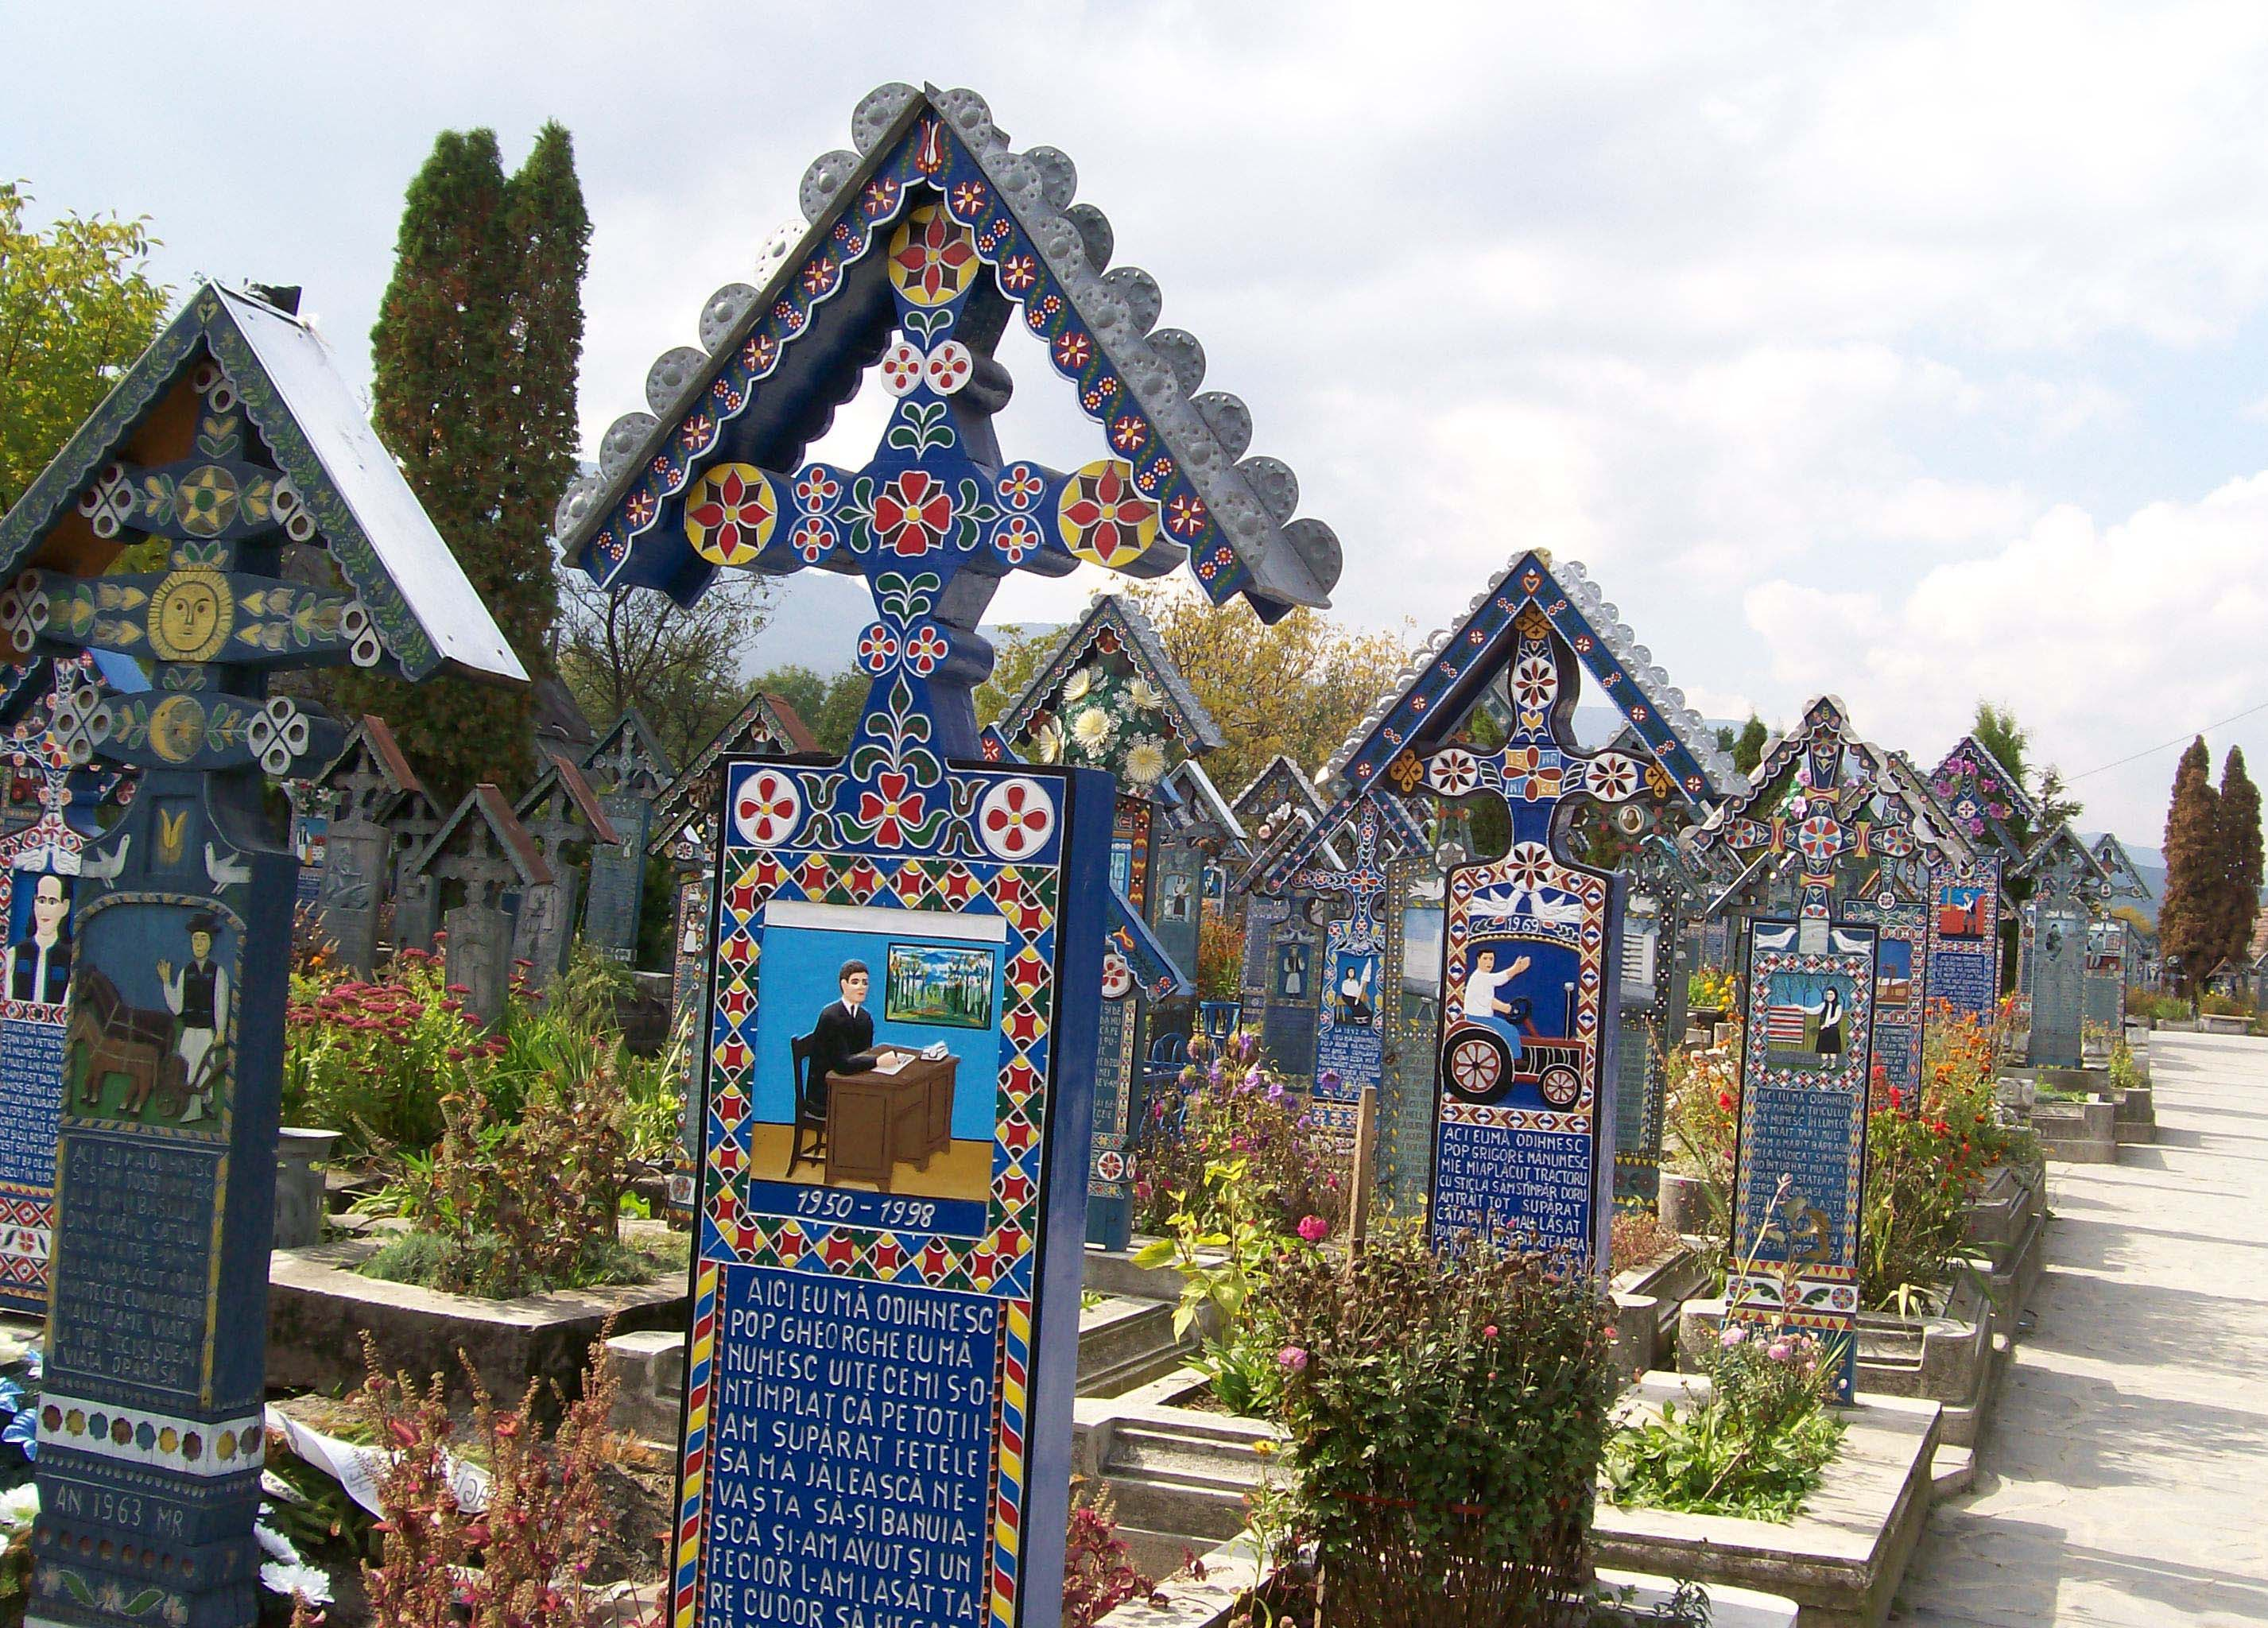 Poemas del ro Wang Merry cemetery